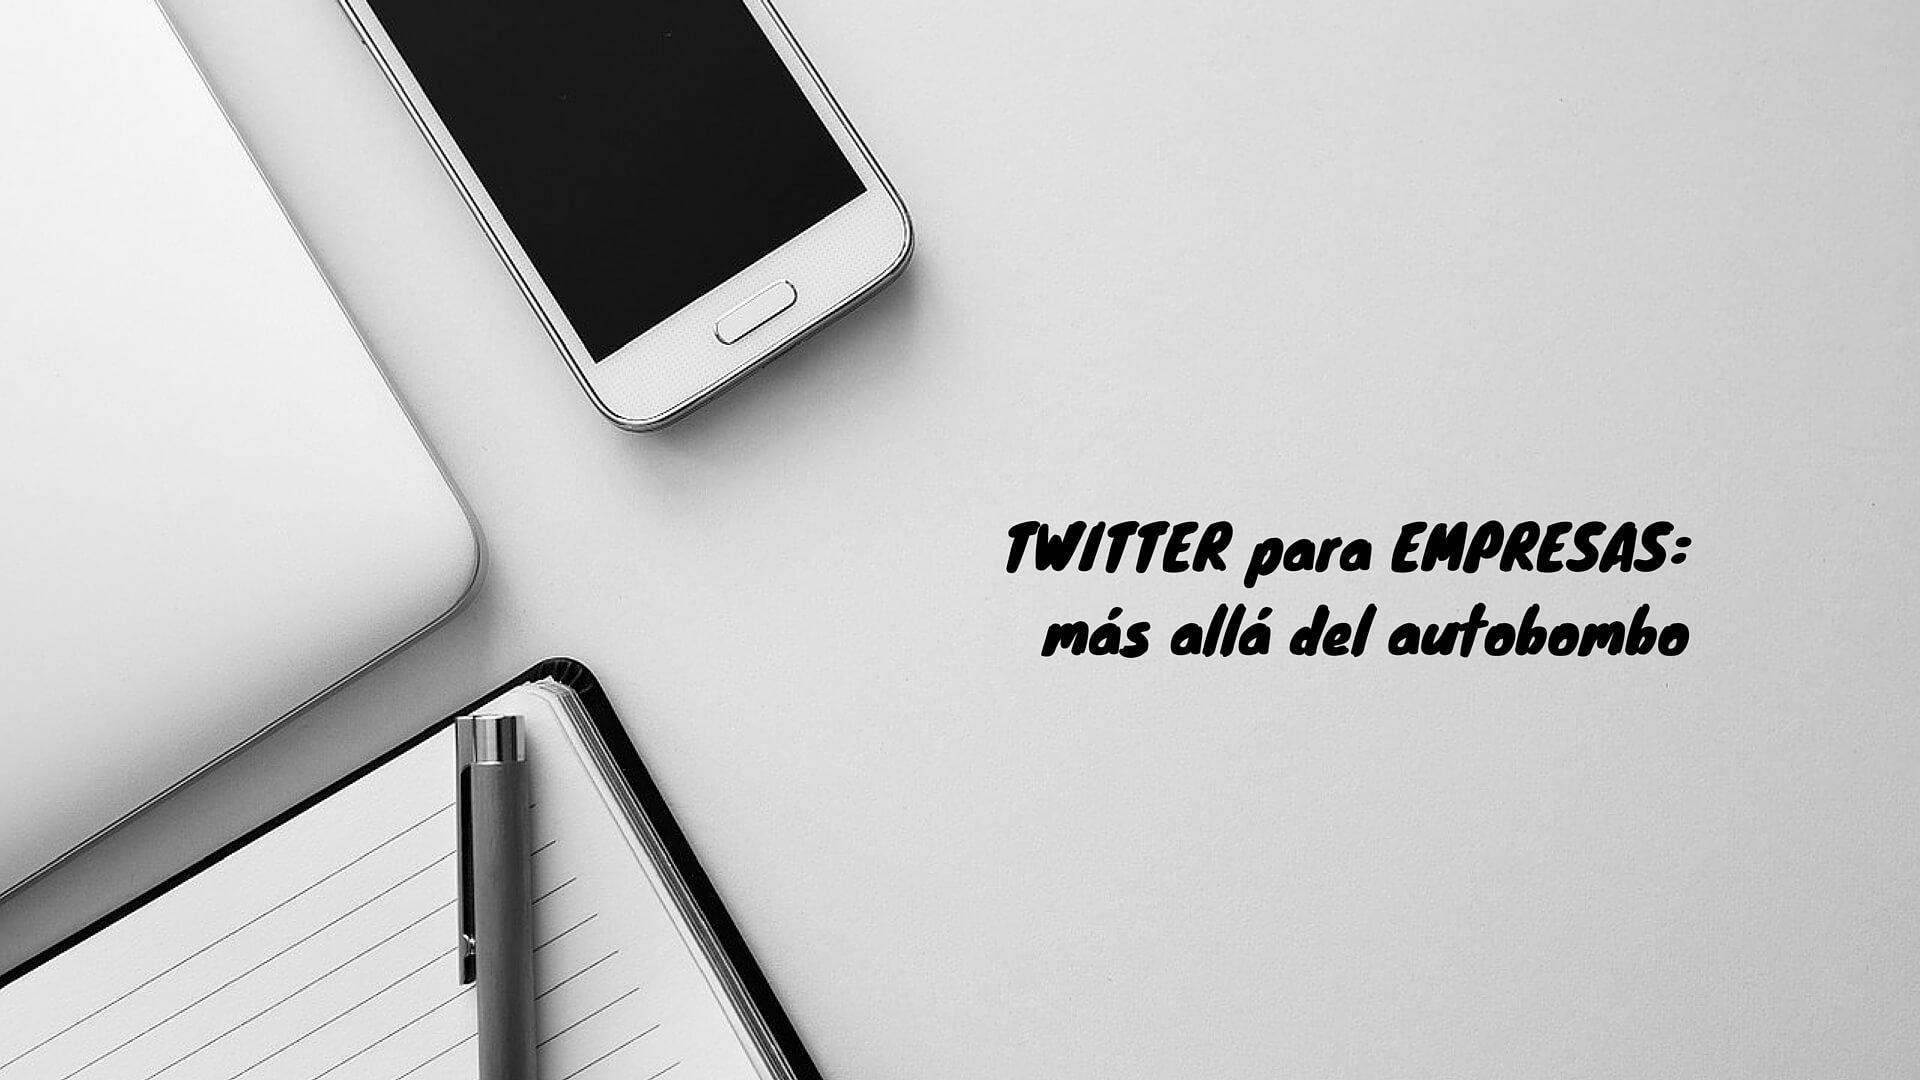 Twitter para empresas: más allá del autobombo